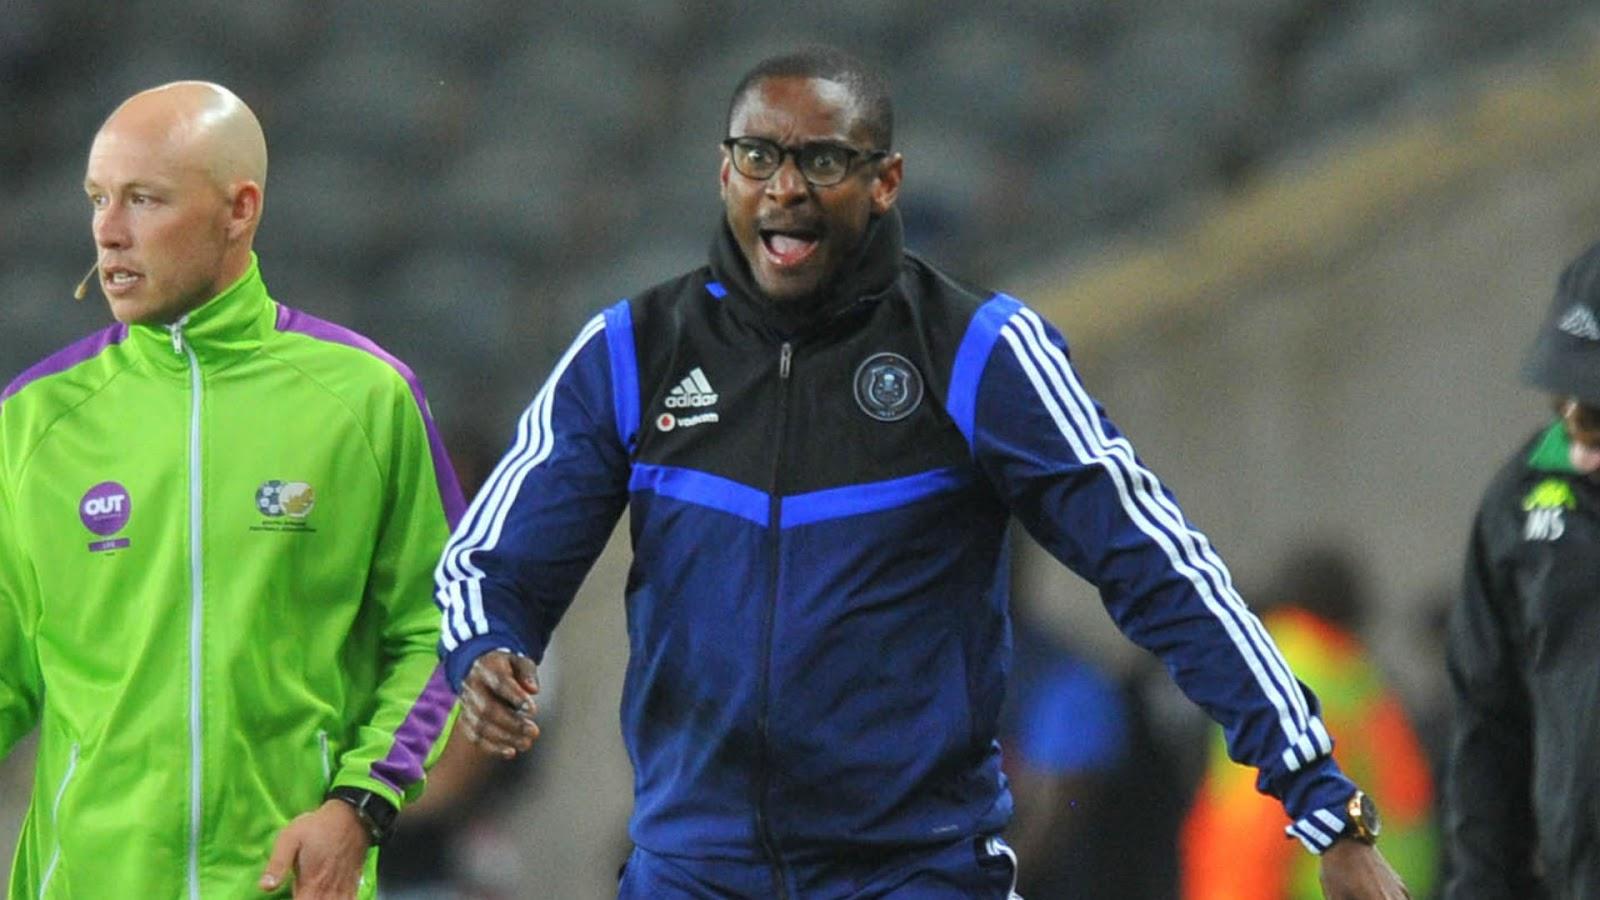 Orlando Pirates interim head coach Rulani Mokwena